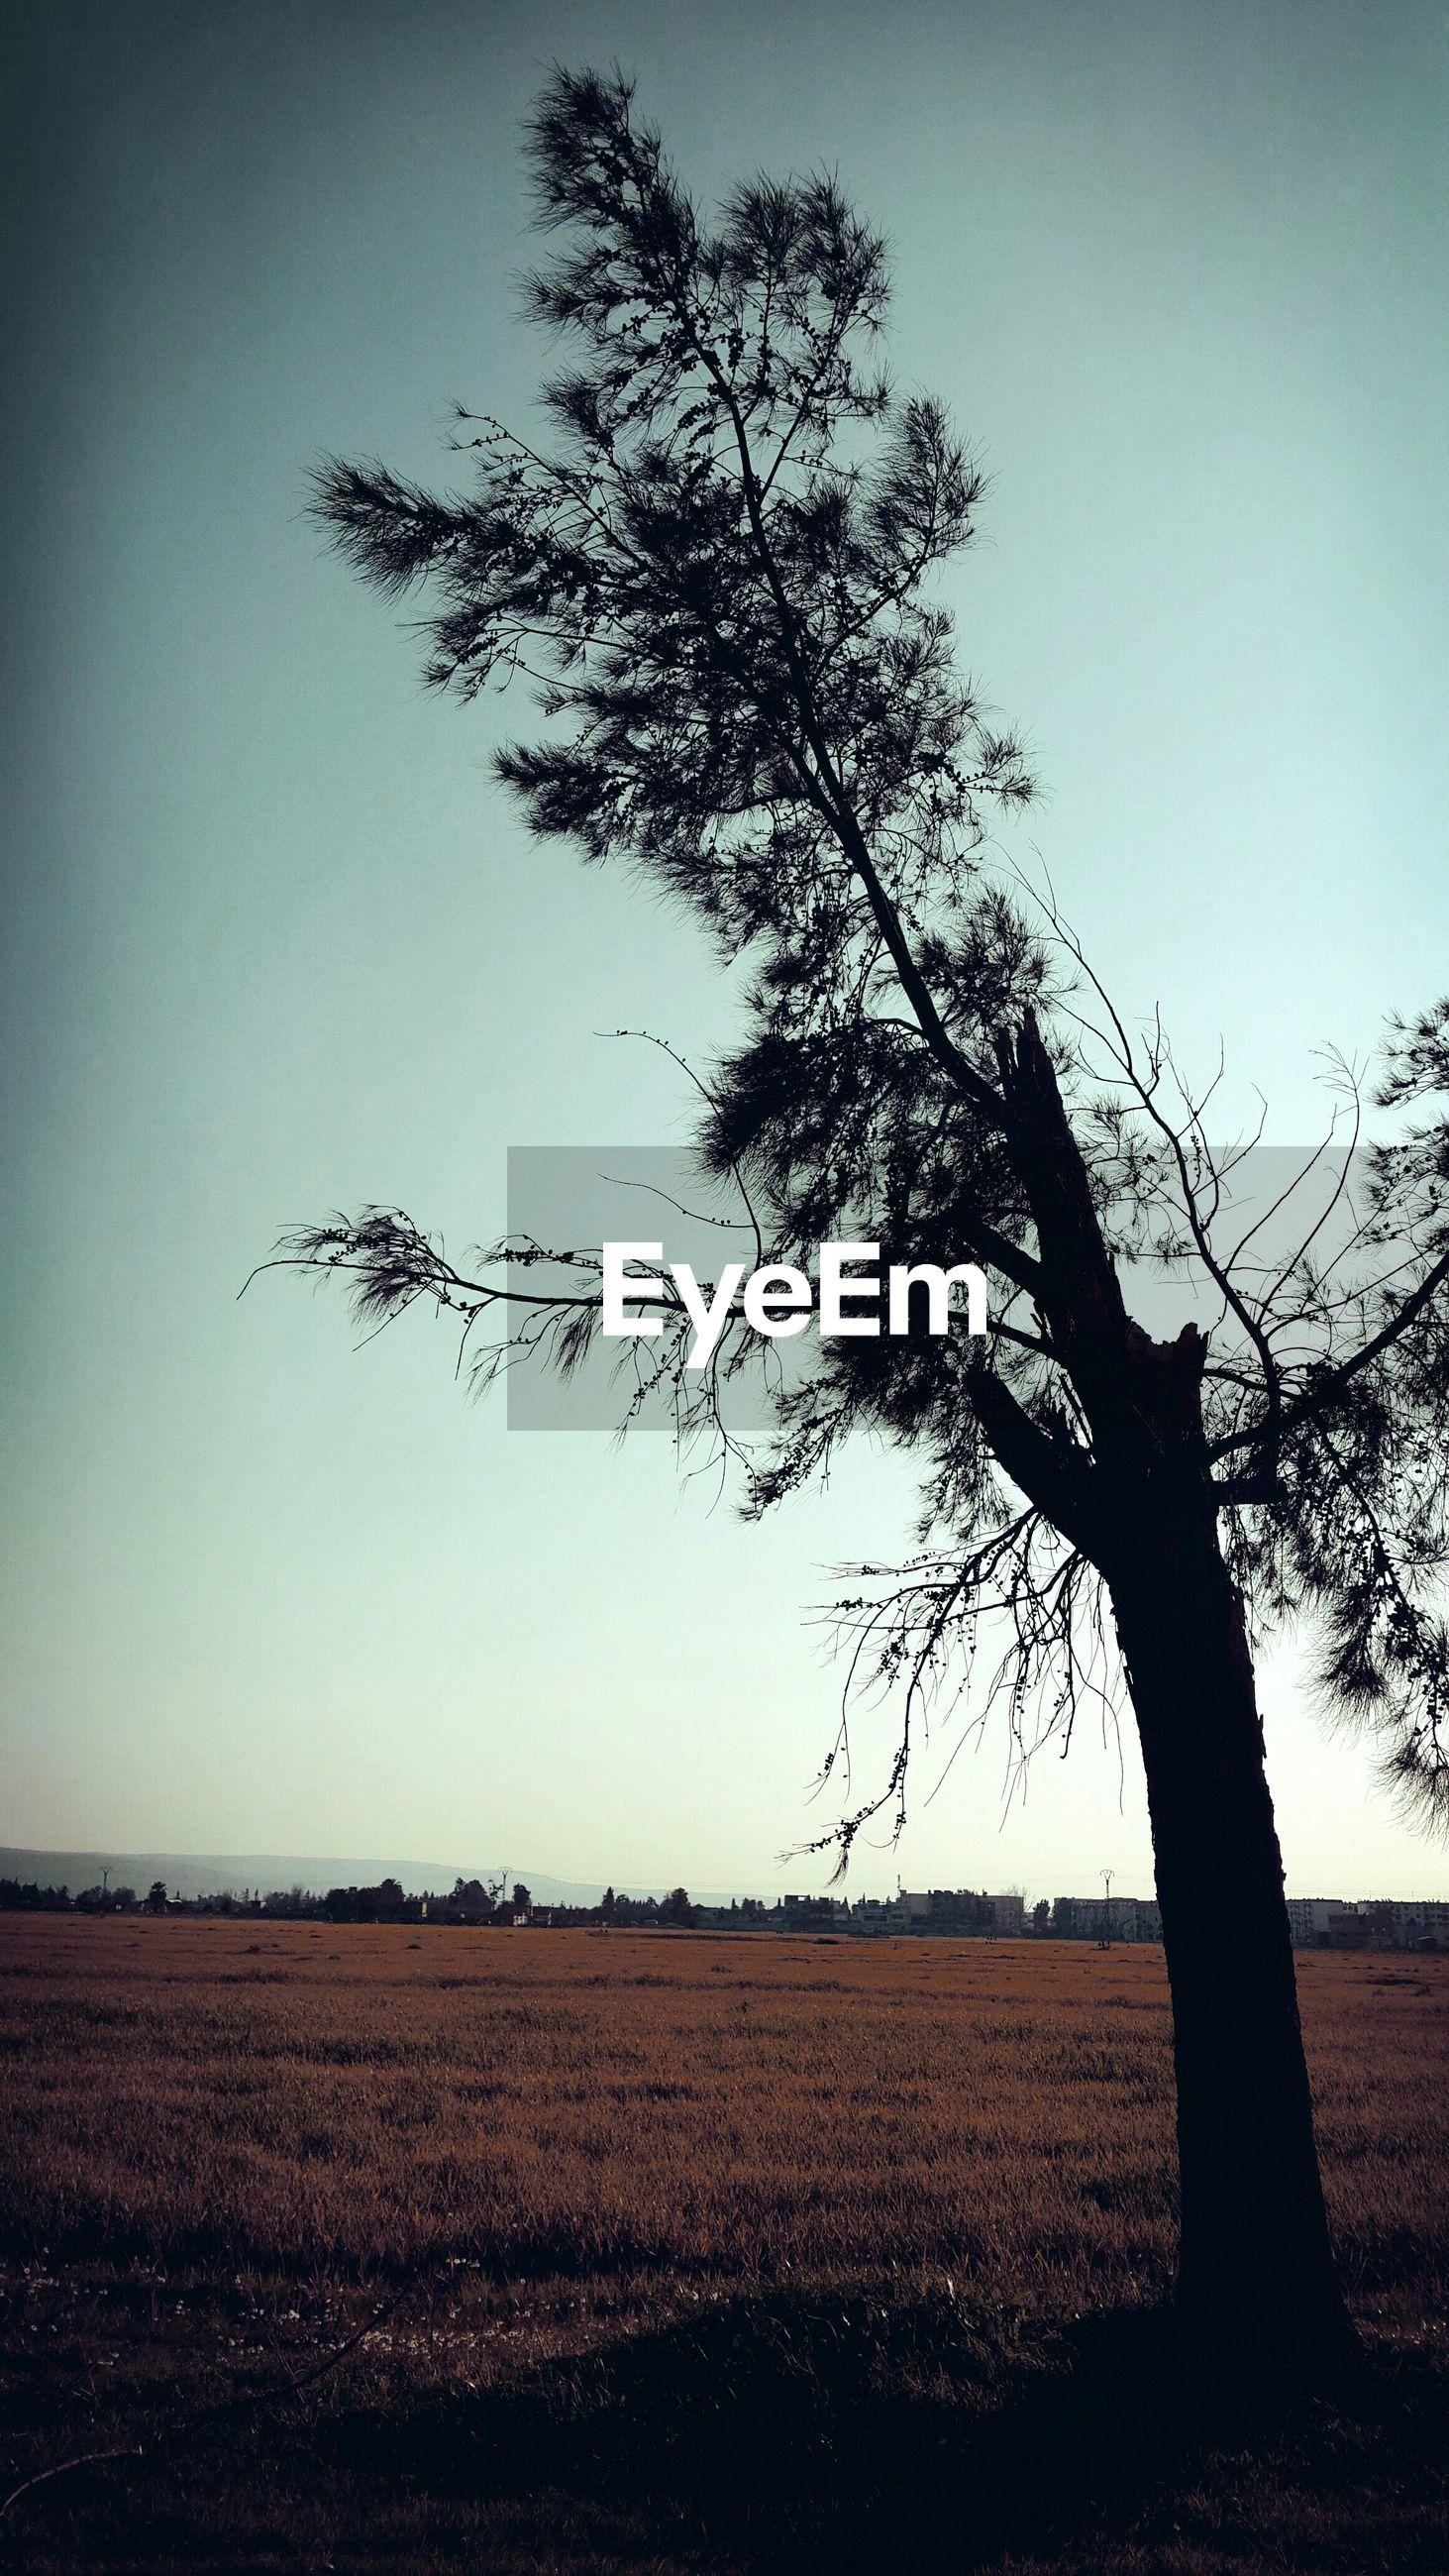 landscape, field, tranquility, tranquil scene, tree, bare tree, clear sky, scenics, nature, beauty in nature, rural scene, horizon over land, branch, sky, growth, non-urban scene, solitude, silhouette, single tree, remote